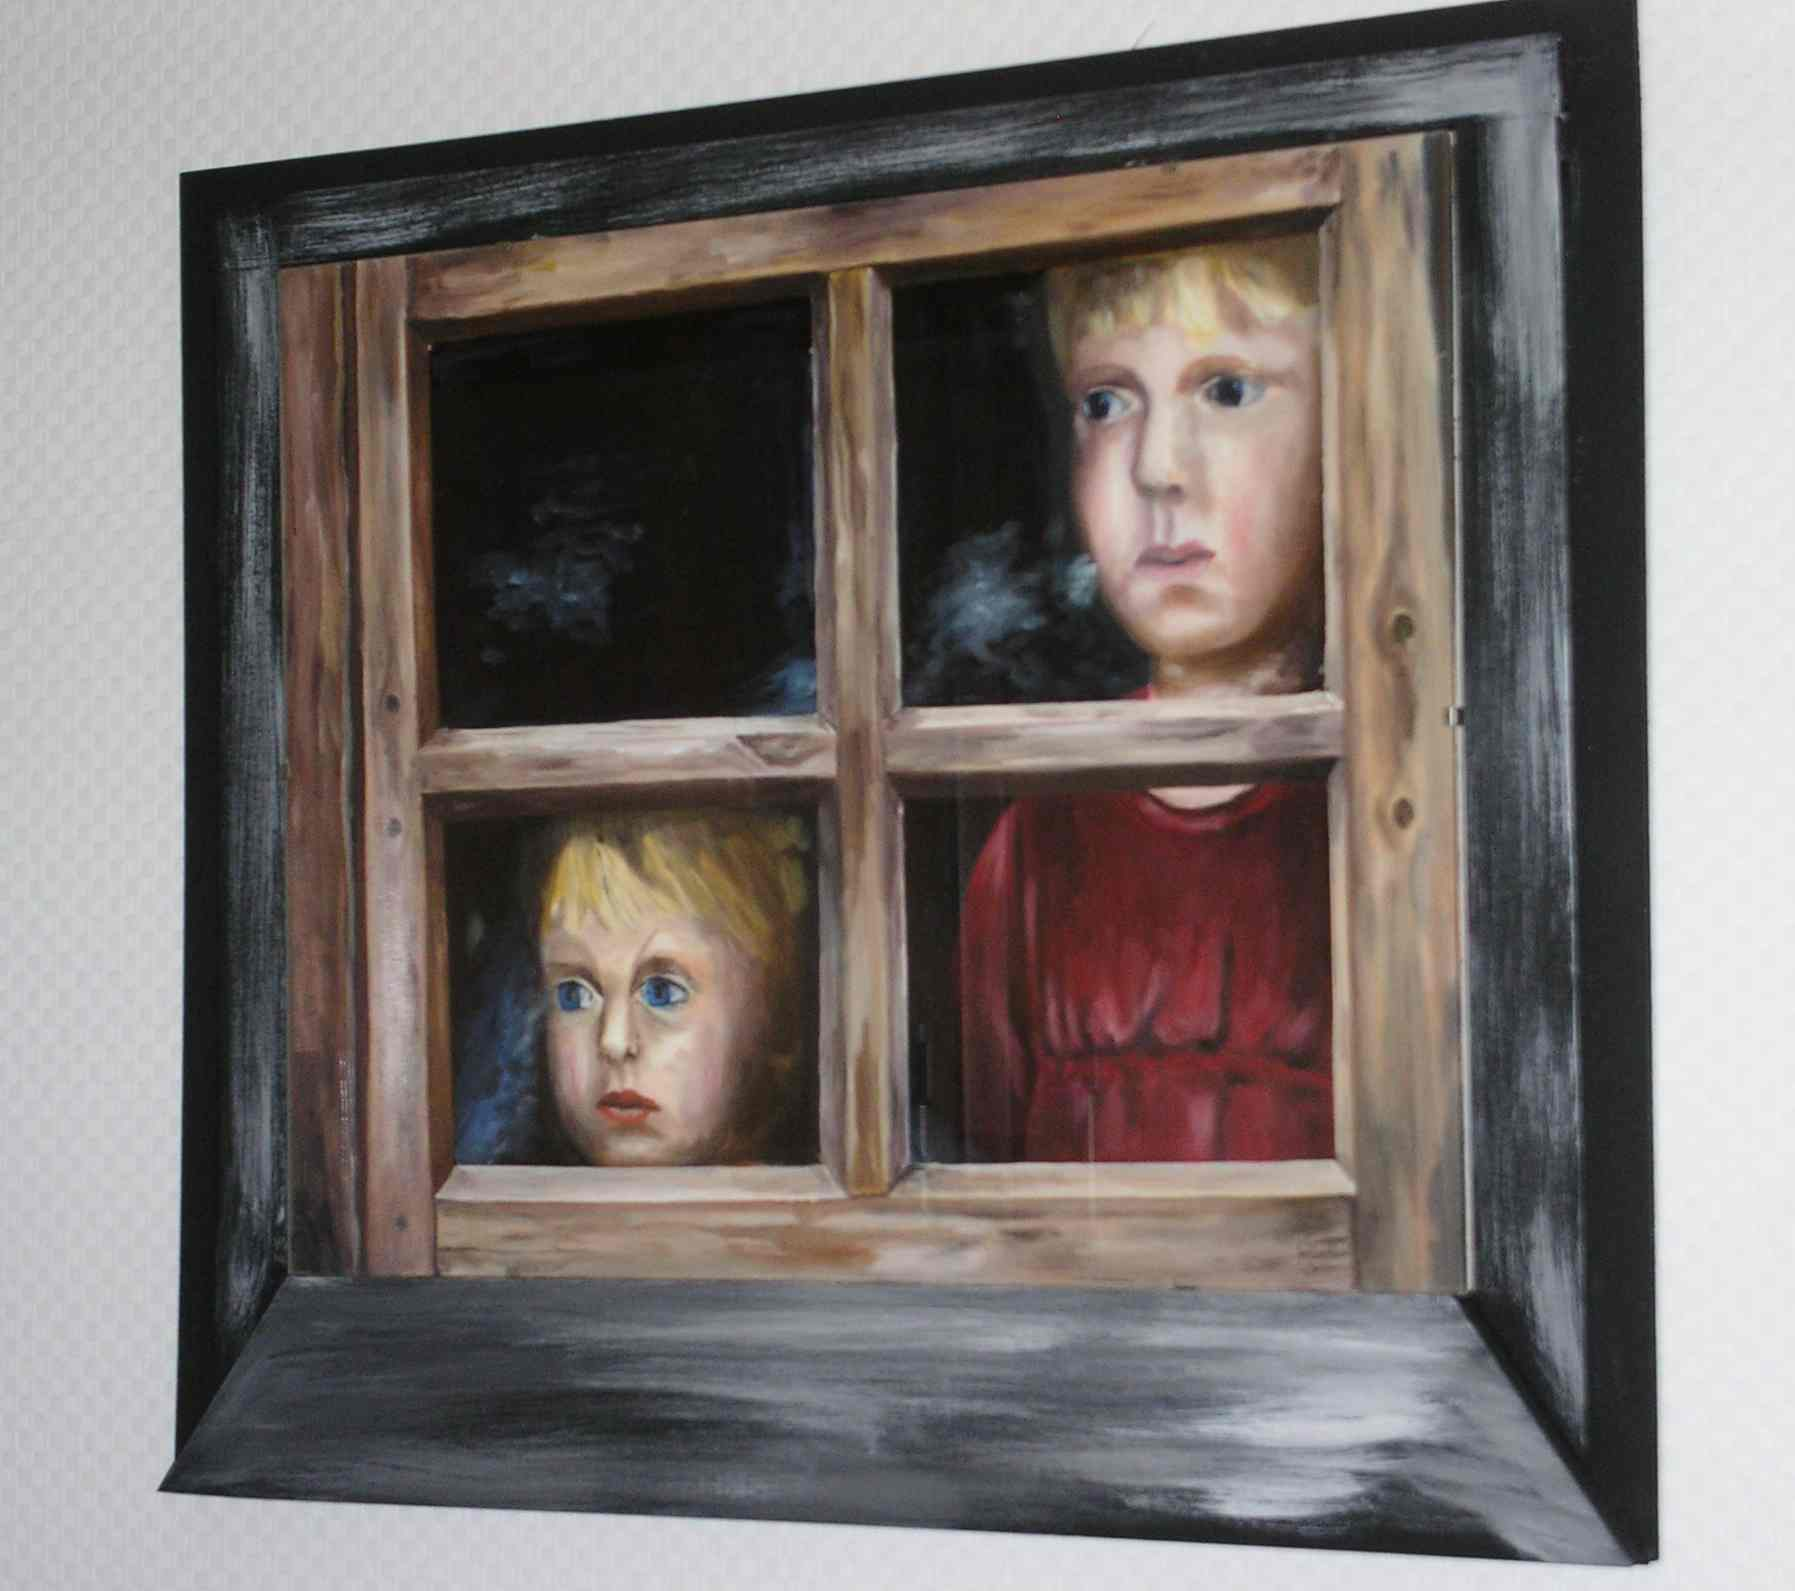 bild figural malerei menschen kinder von gisela ochs bei kunstnet. Black Bedroom Furniture Sets. Home Design Ideas